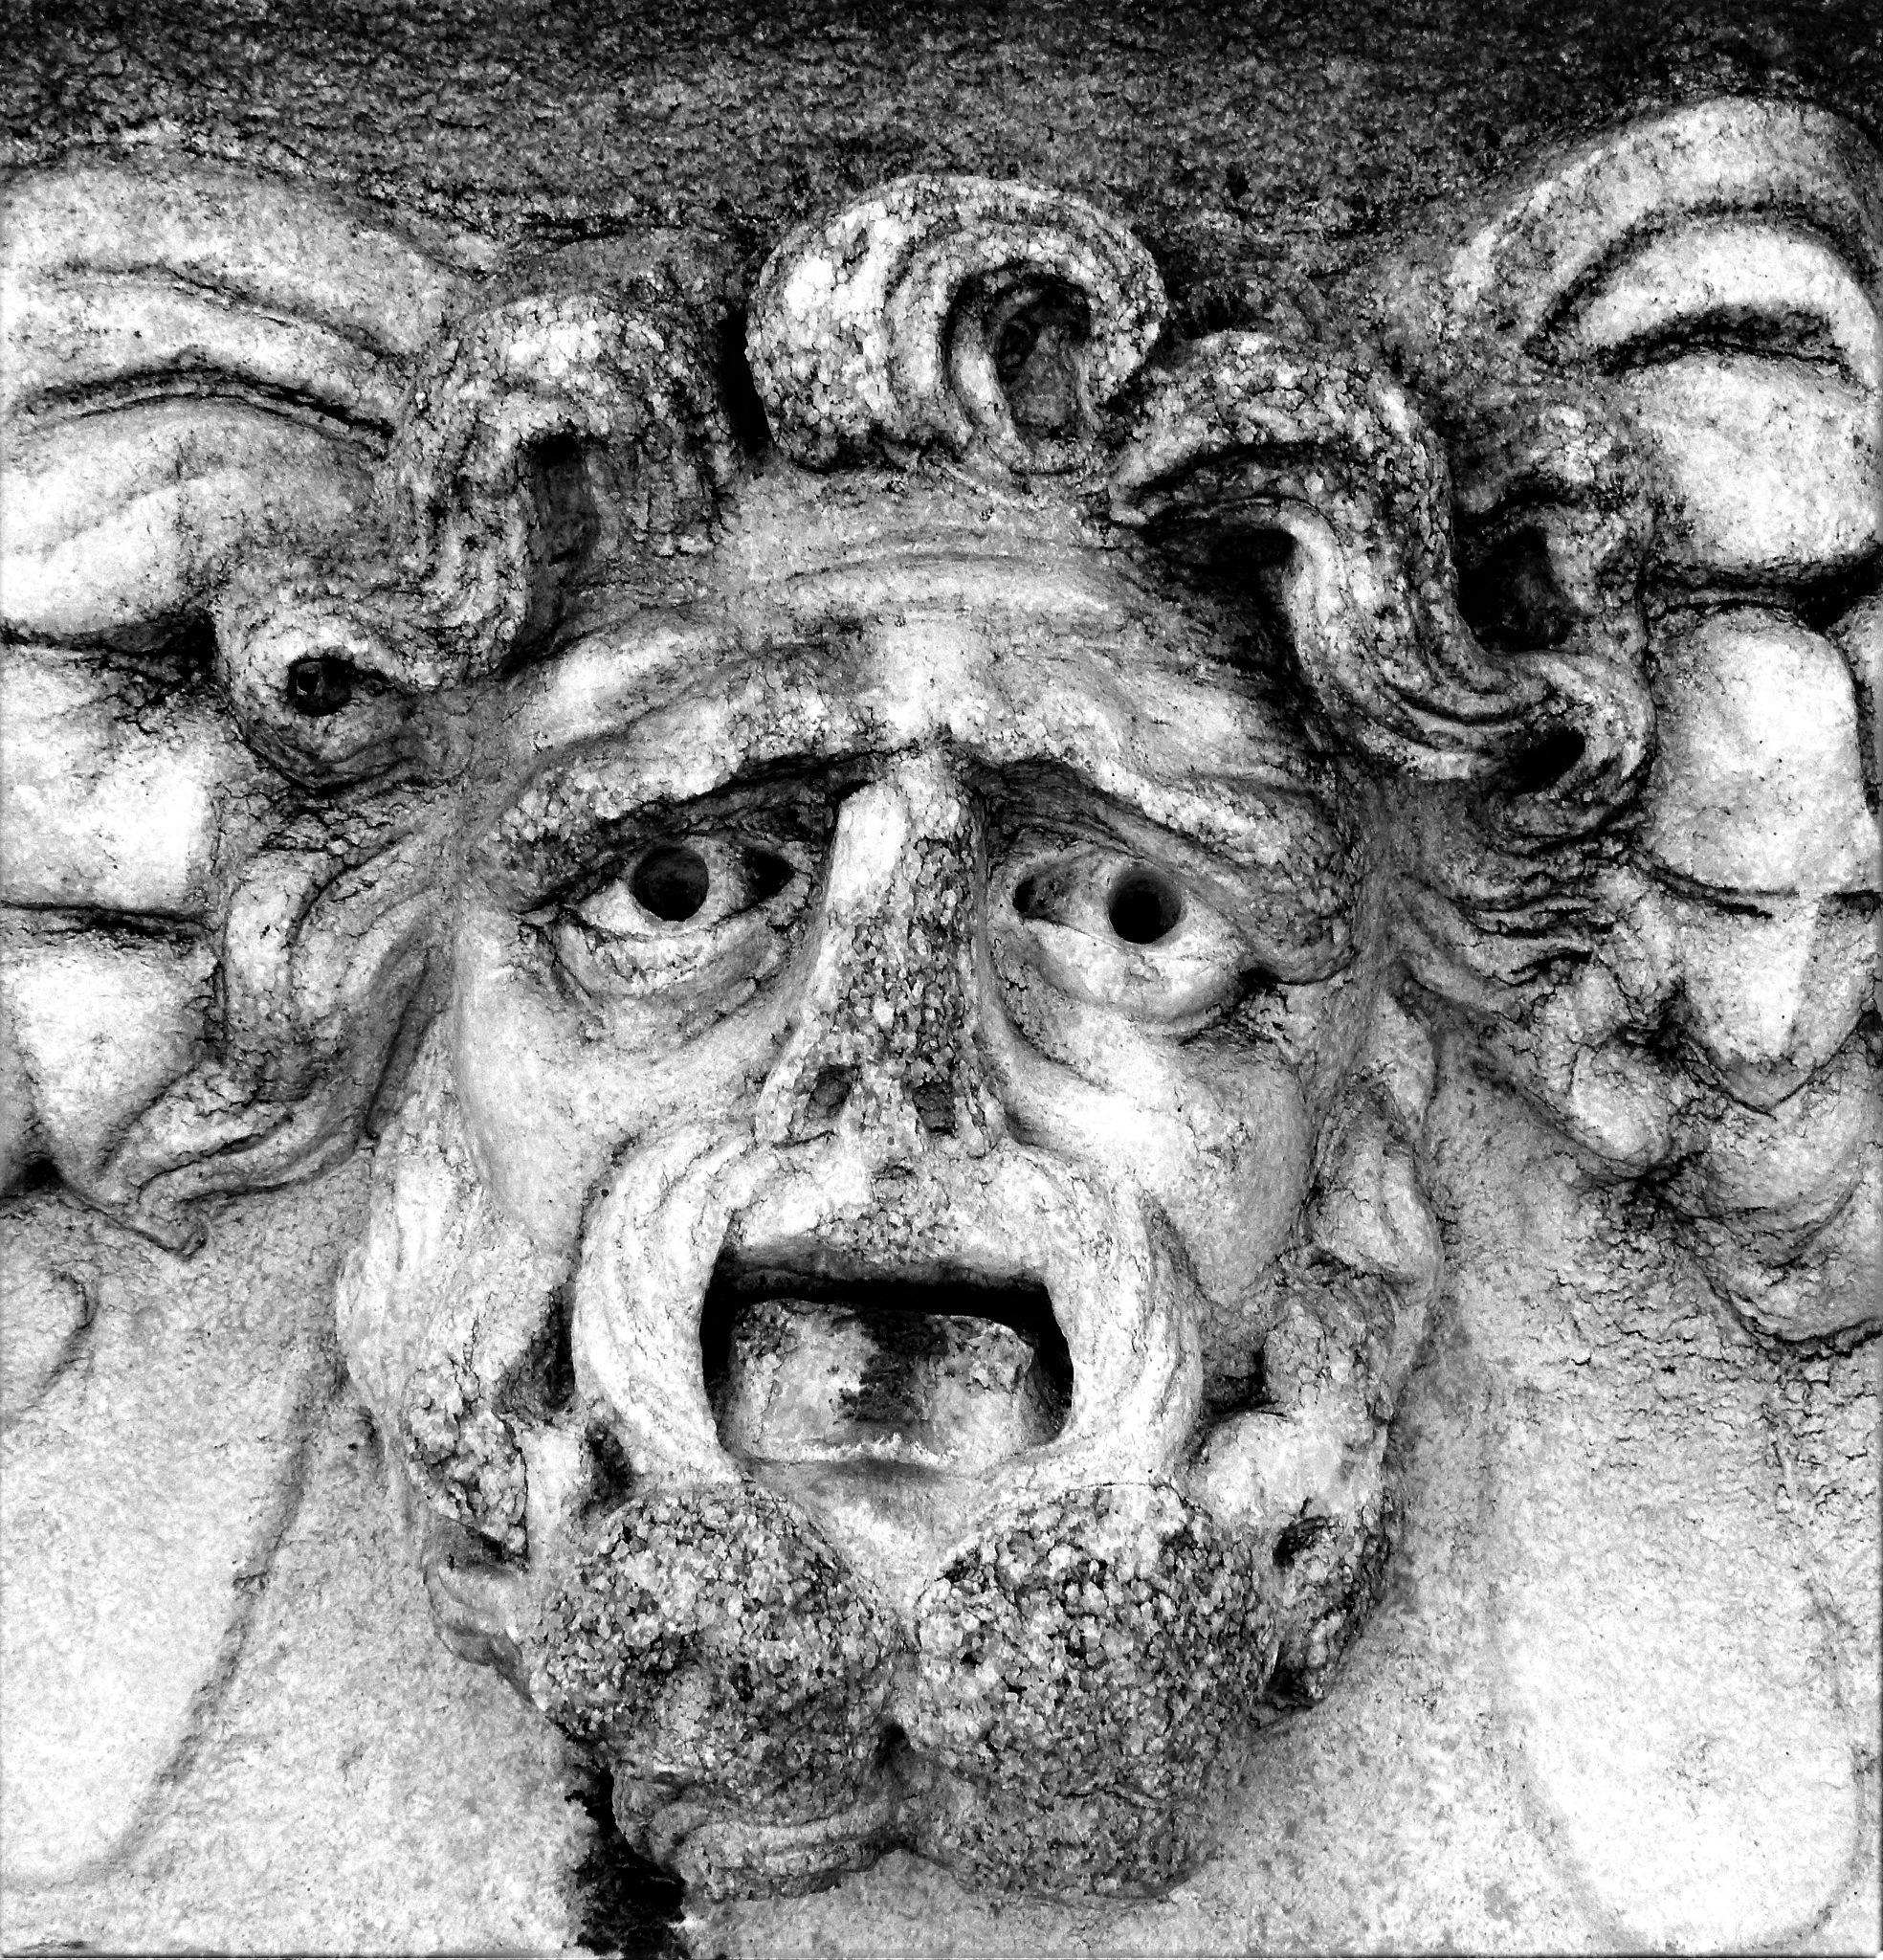 Afrodisias 16Aydın by Murat Erkman